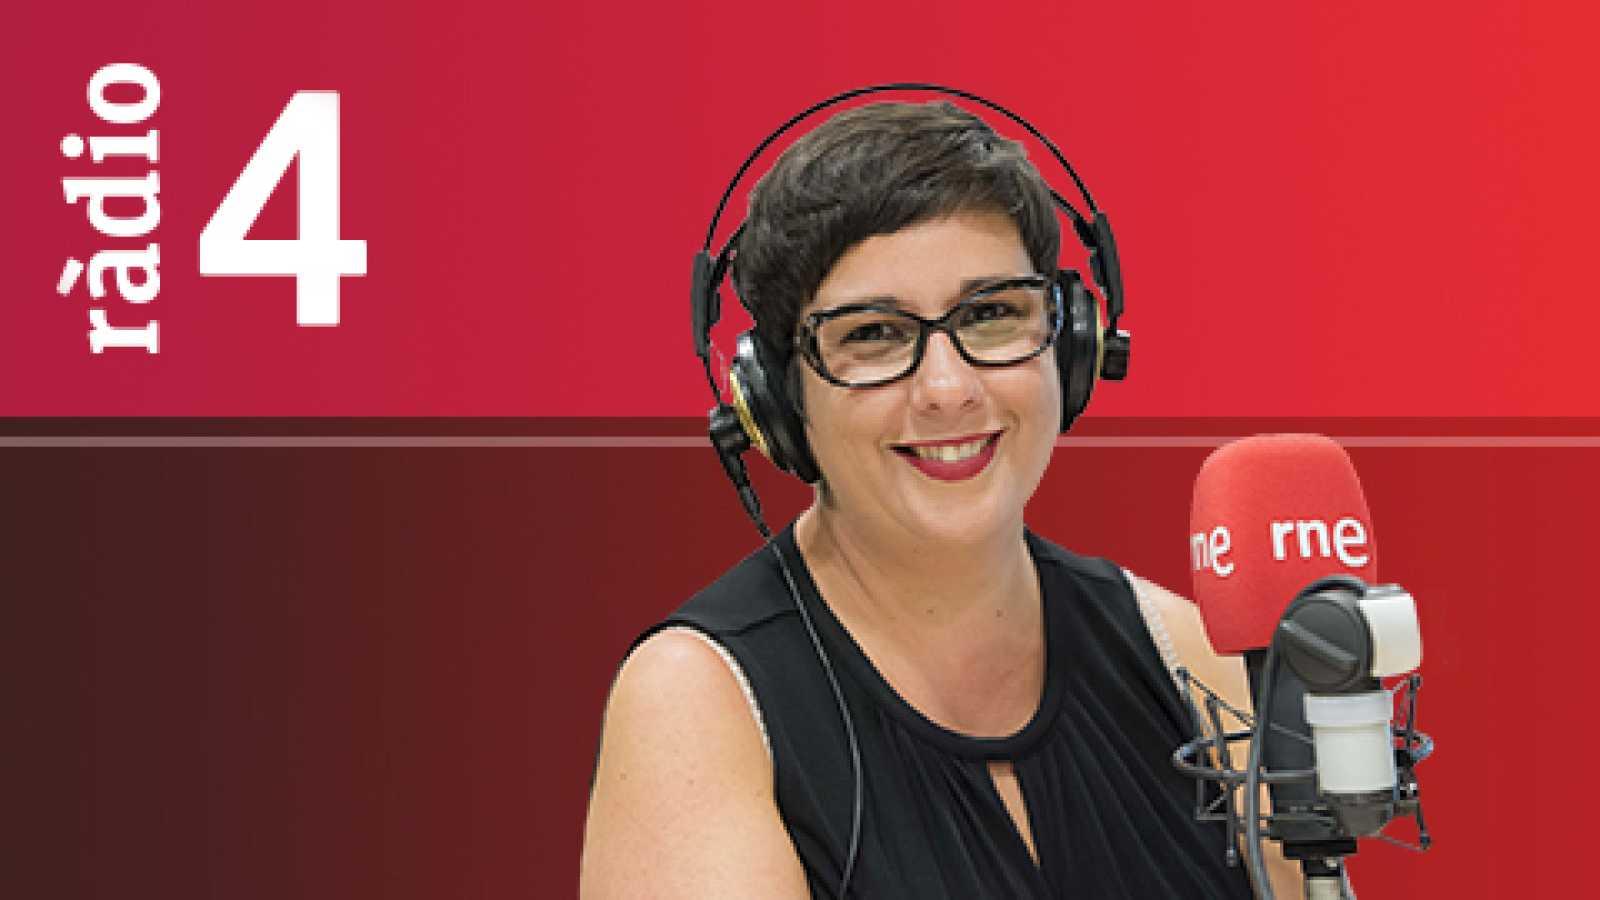 Realpolitik - Dimas Gragera, Glòria Freixa, Raul Moreno